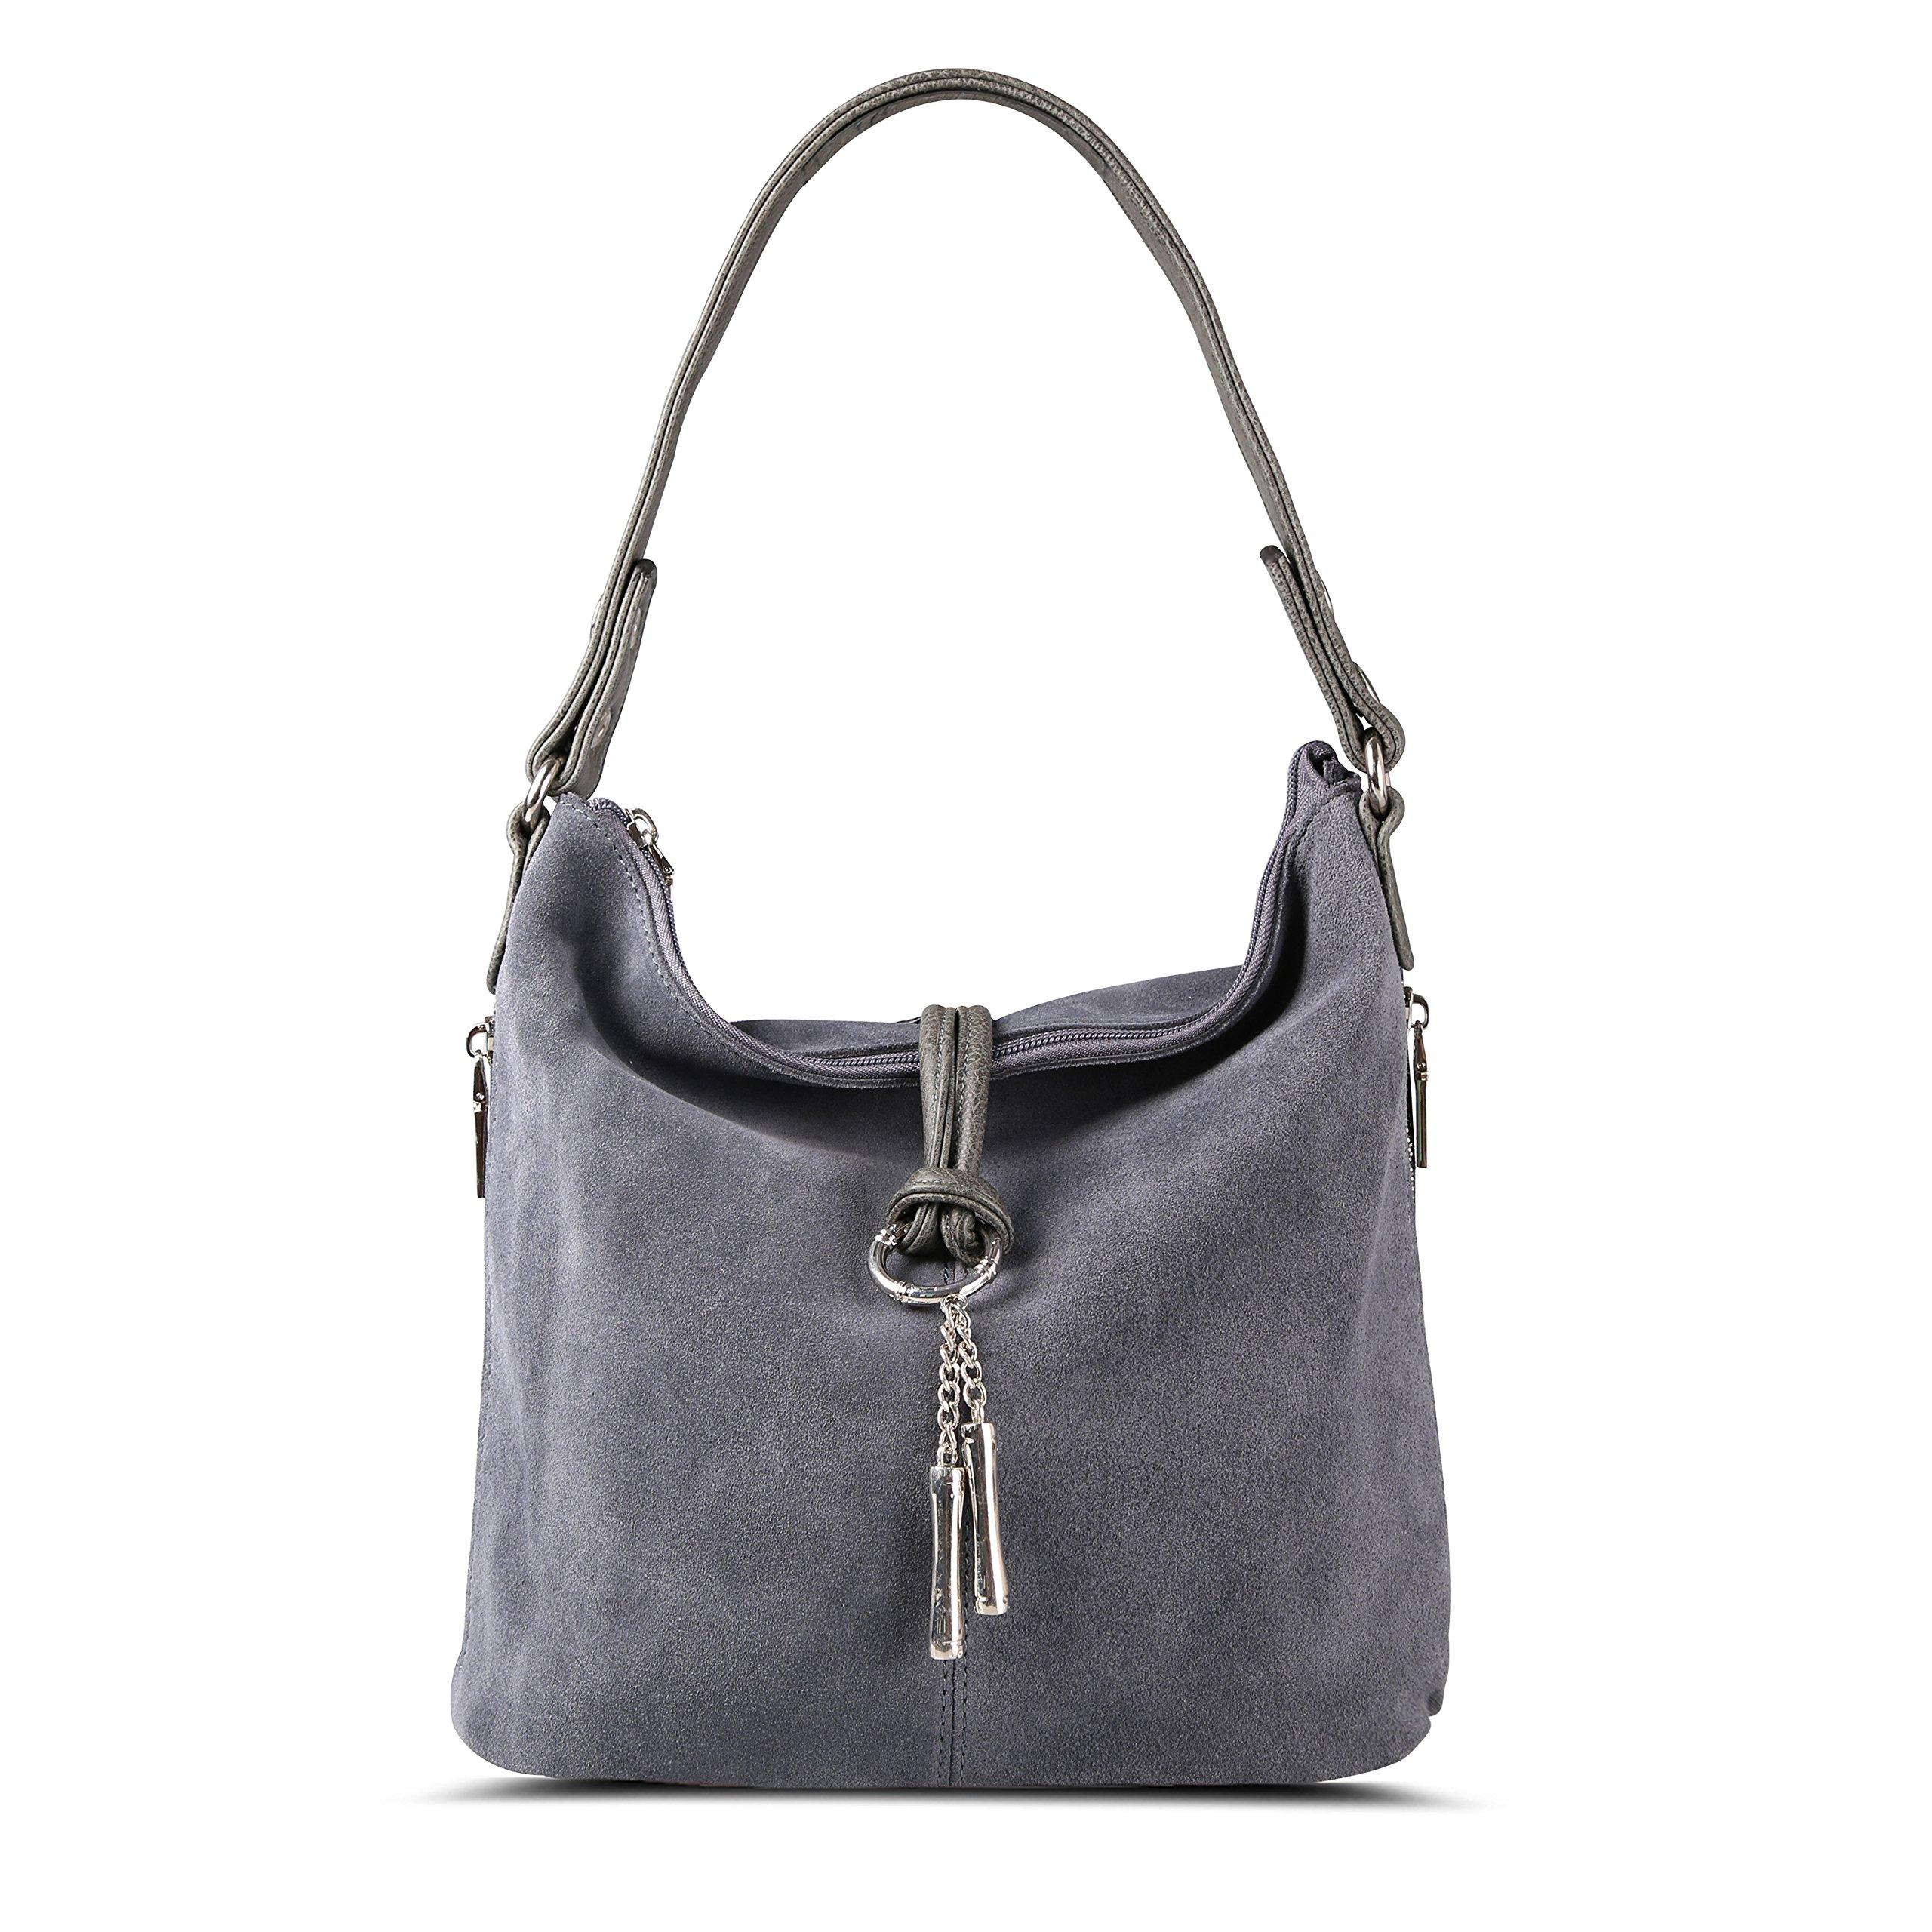 Nico Louise Women Purse Suede Split Real Leather Shoulder Bag Casual Crossbody Hobo handbag (LightGrey) by Nico Louise